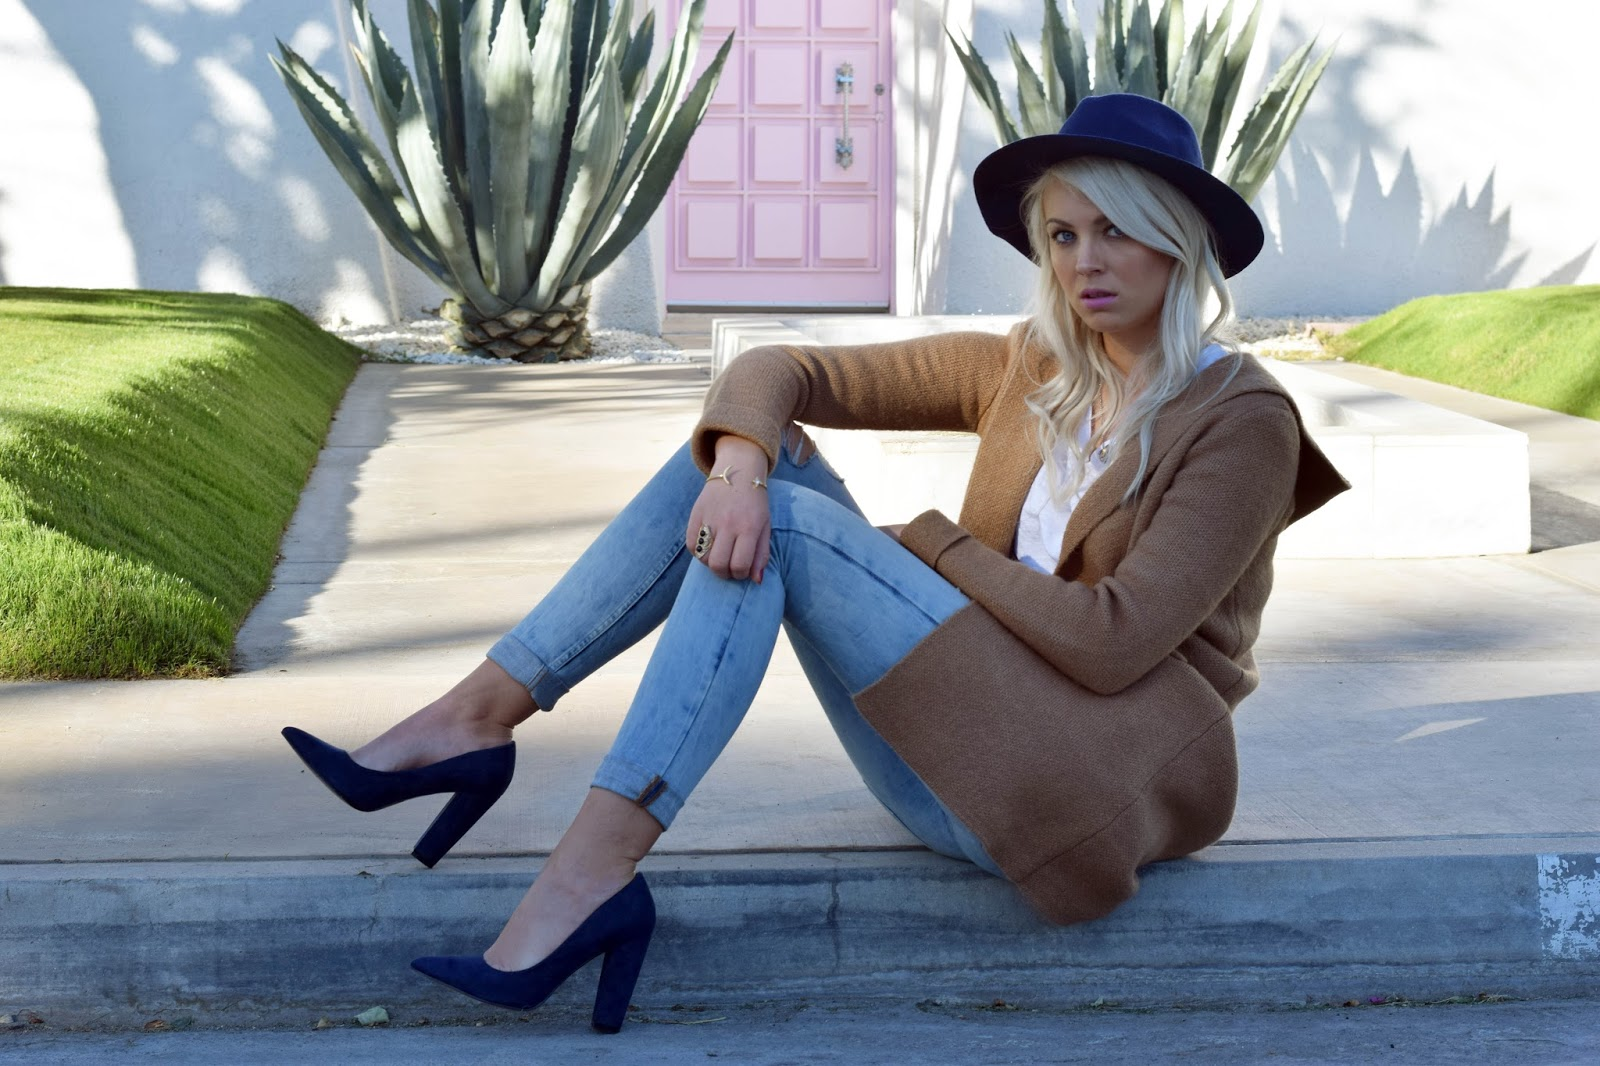 shushop, long cardigan, blue heels, palm springs, pink door